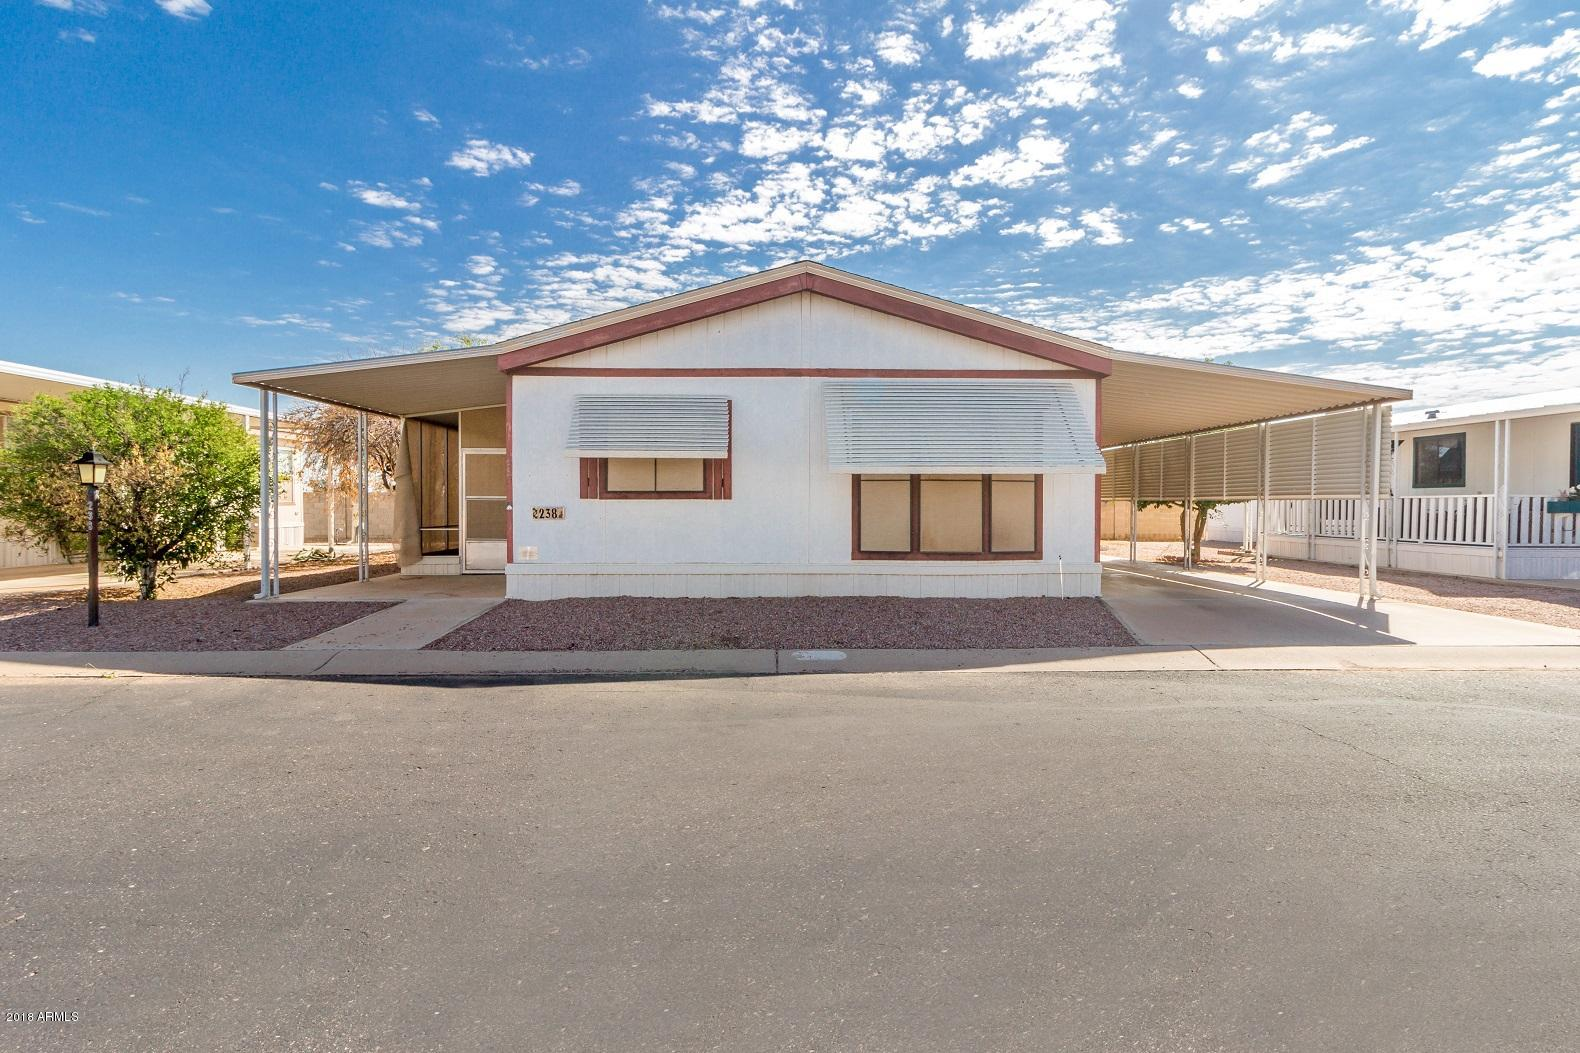 MLS 5824329 450 W Sunwest Drive Unit 238, Casa Grande, AZ Casa Grande AZ Adult Community